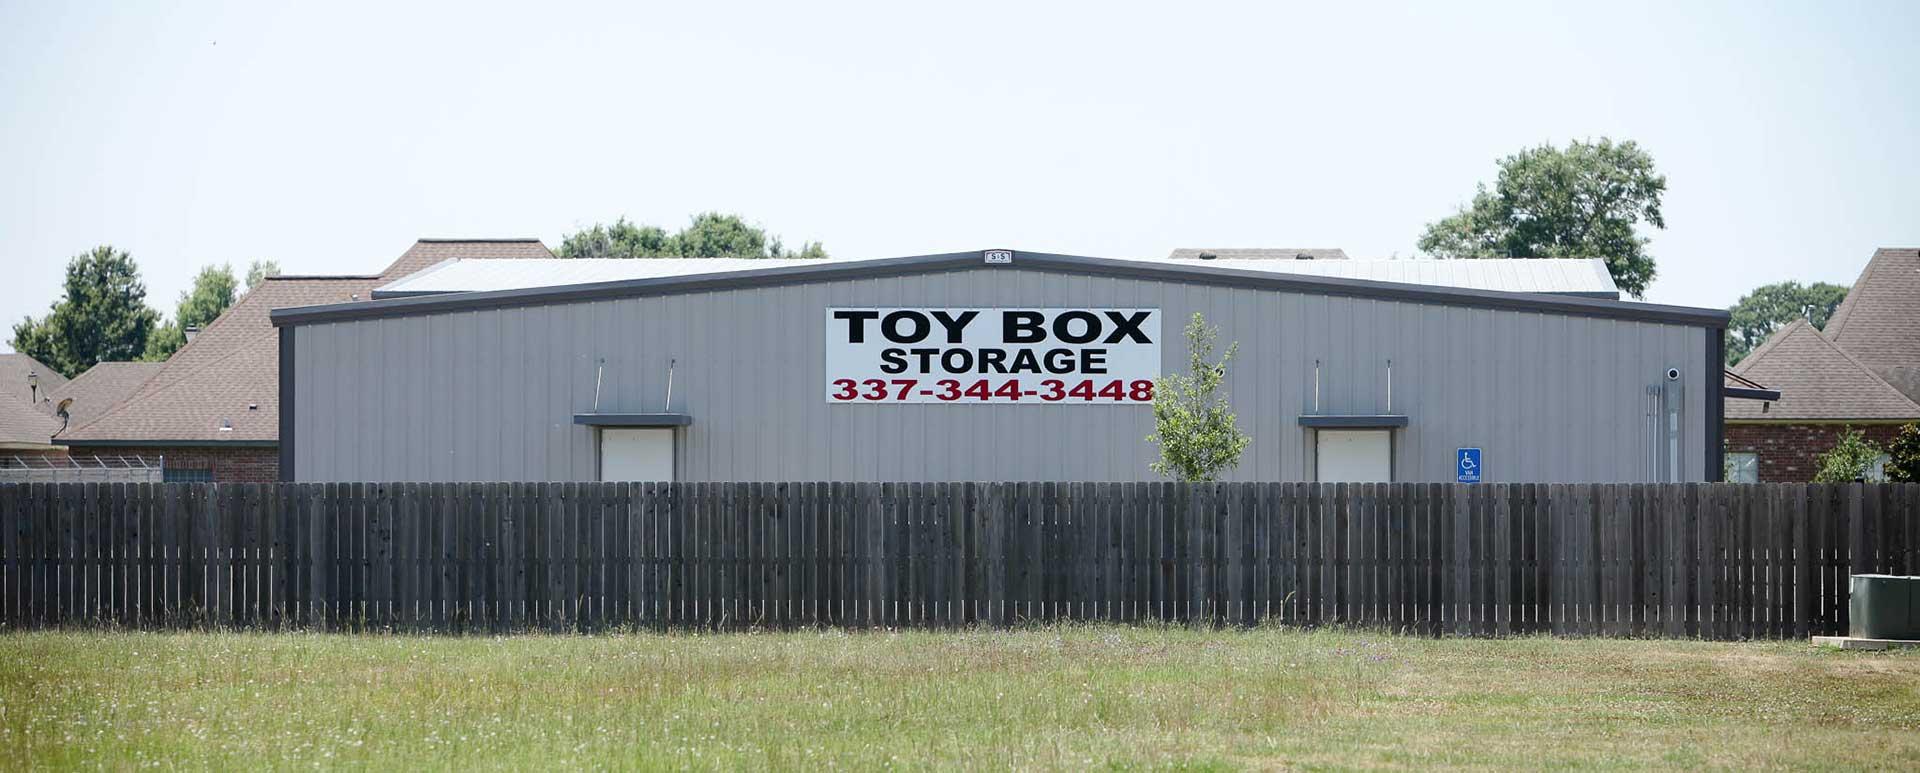 Toy Box Self-Storage Youngsville LA